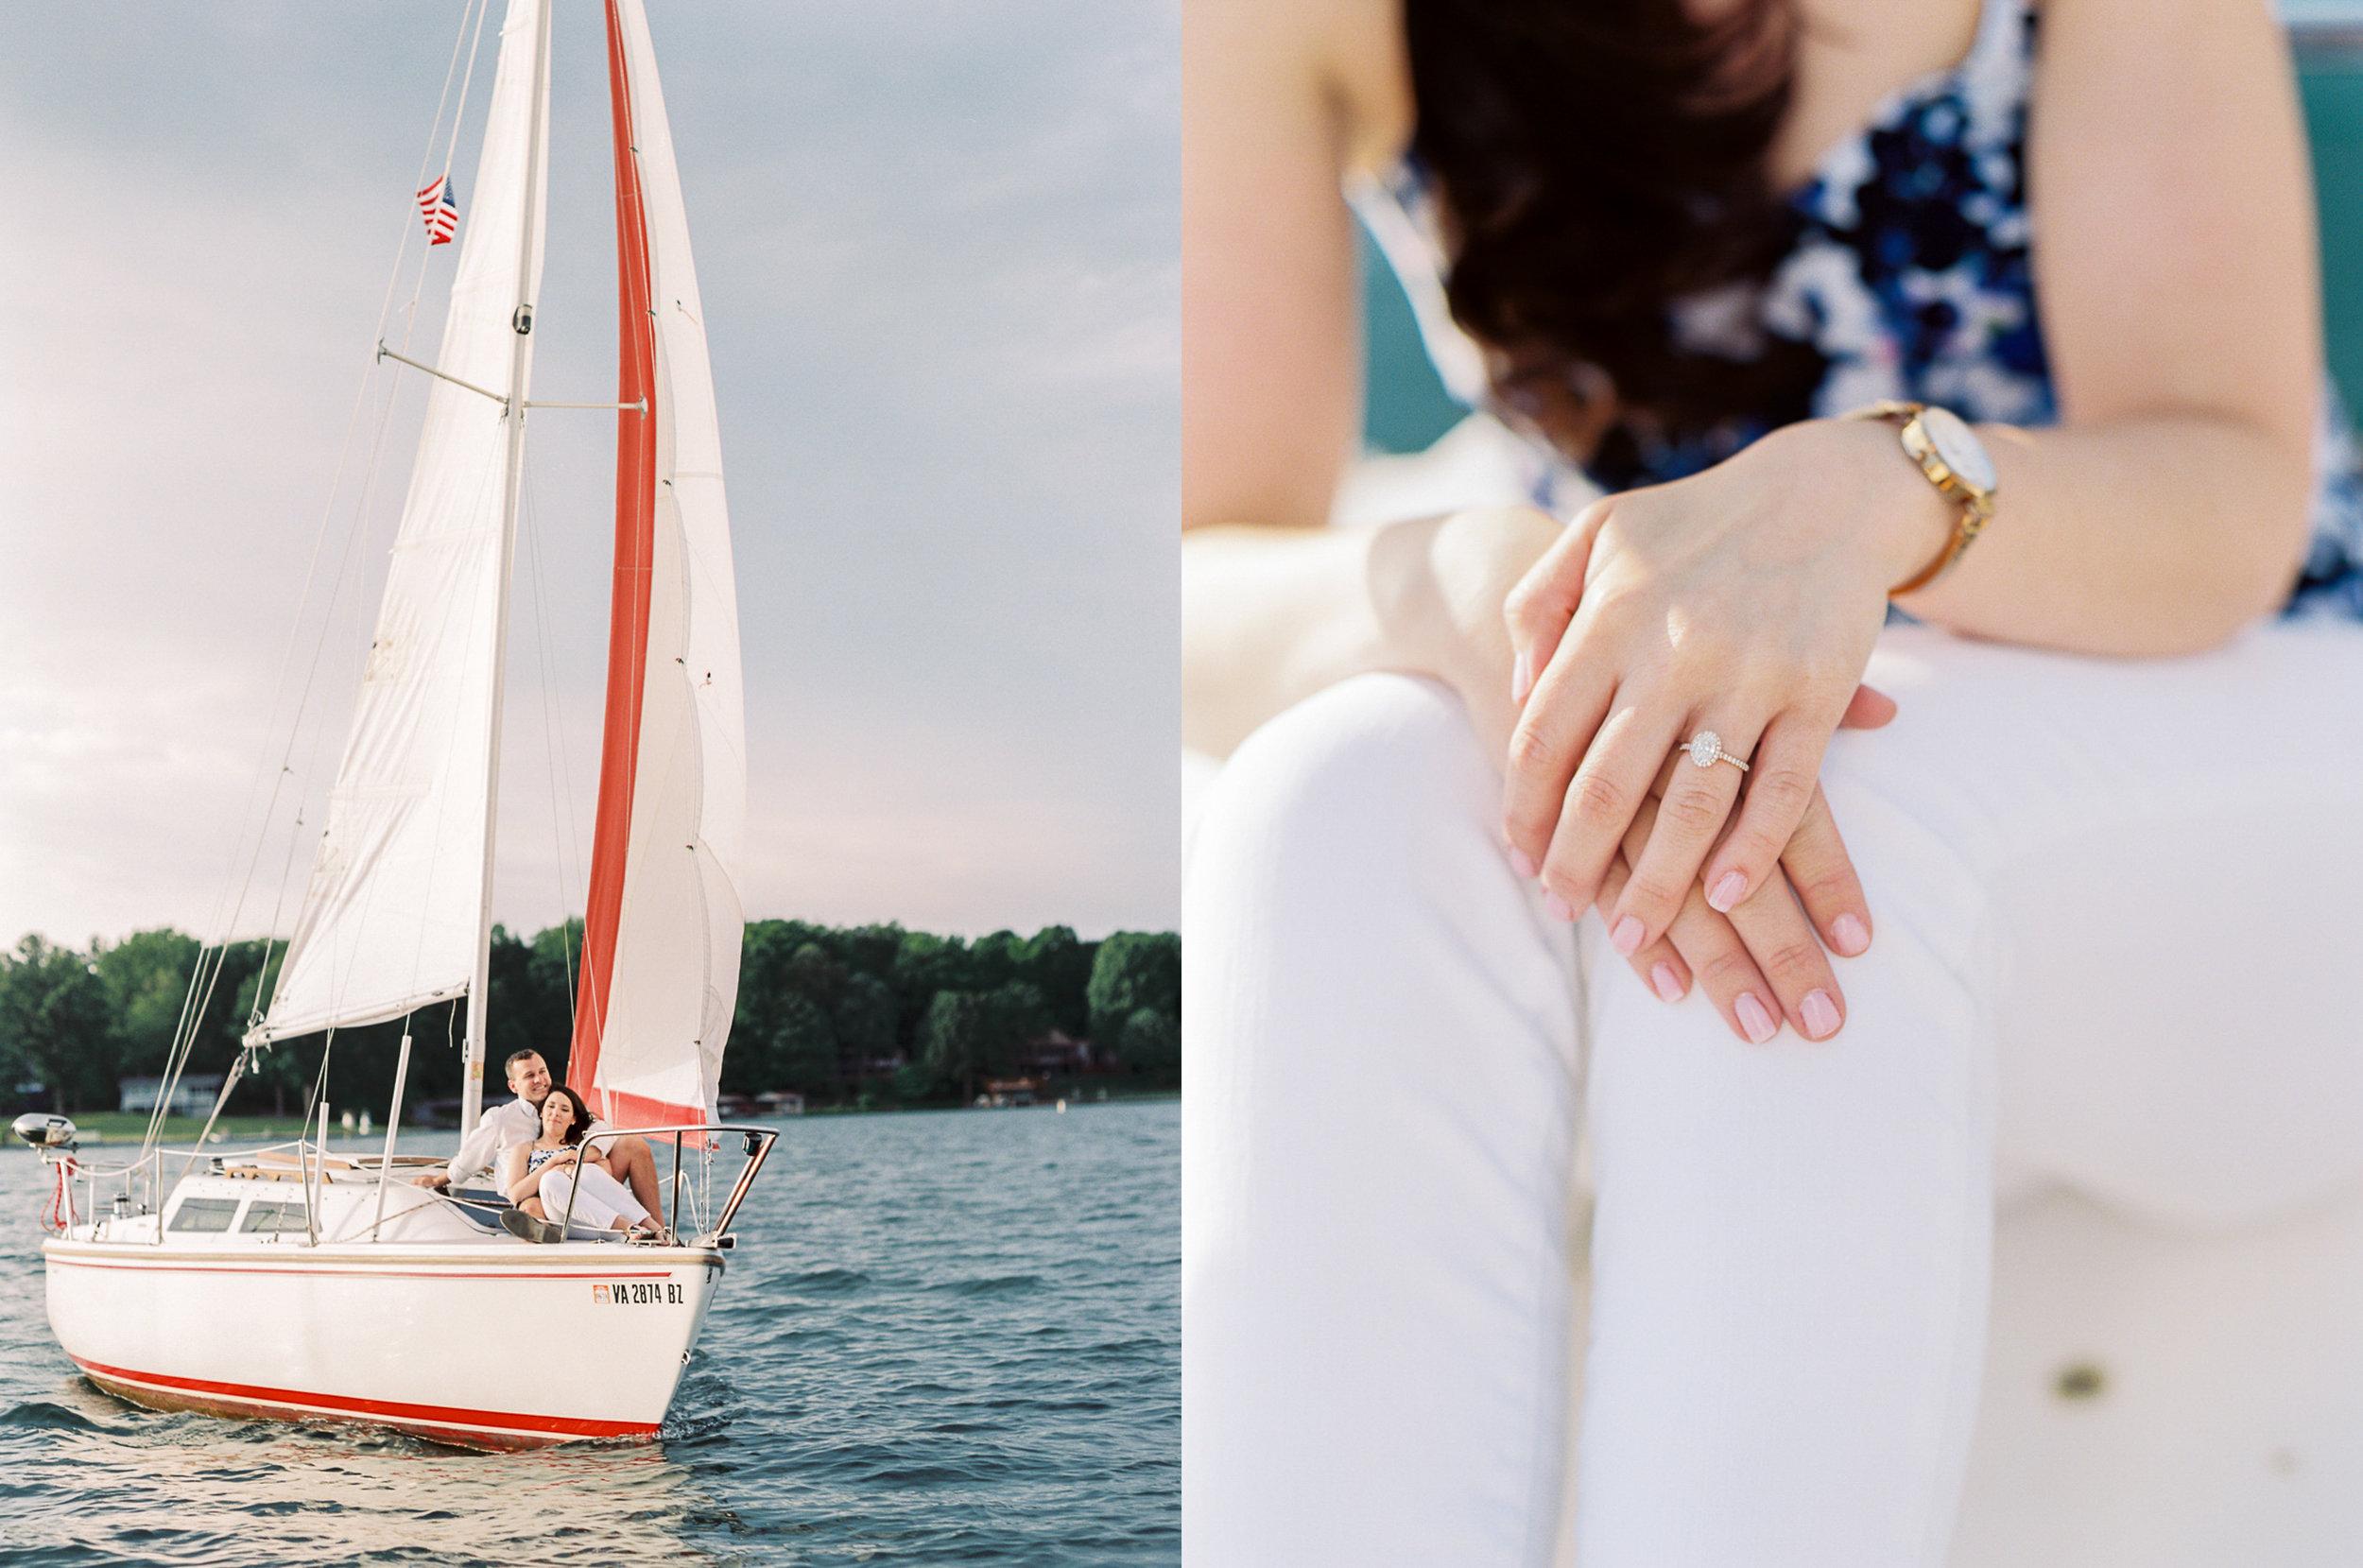 smith-mountain-lake-sailboat-engagement-session-charlotte-sailing-photographer-9.jpg